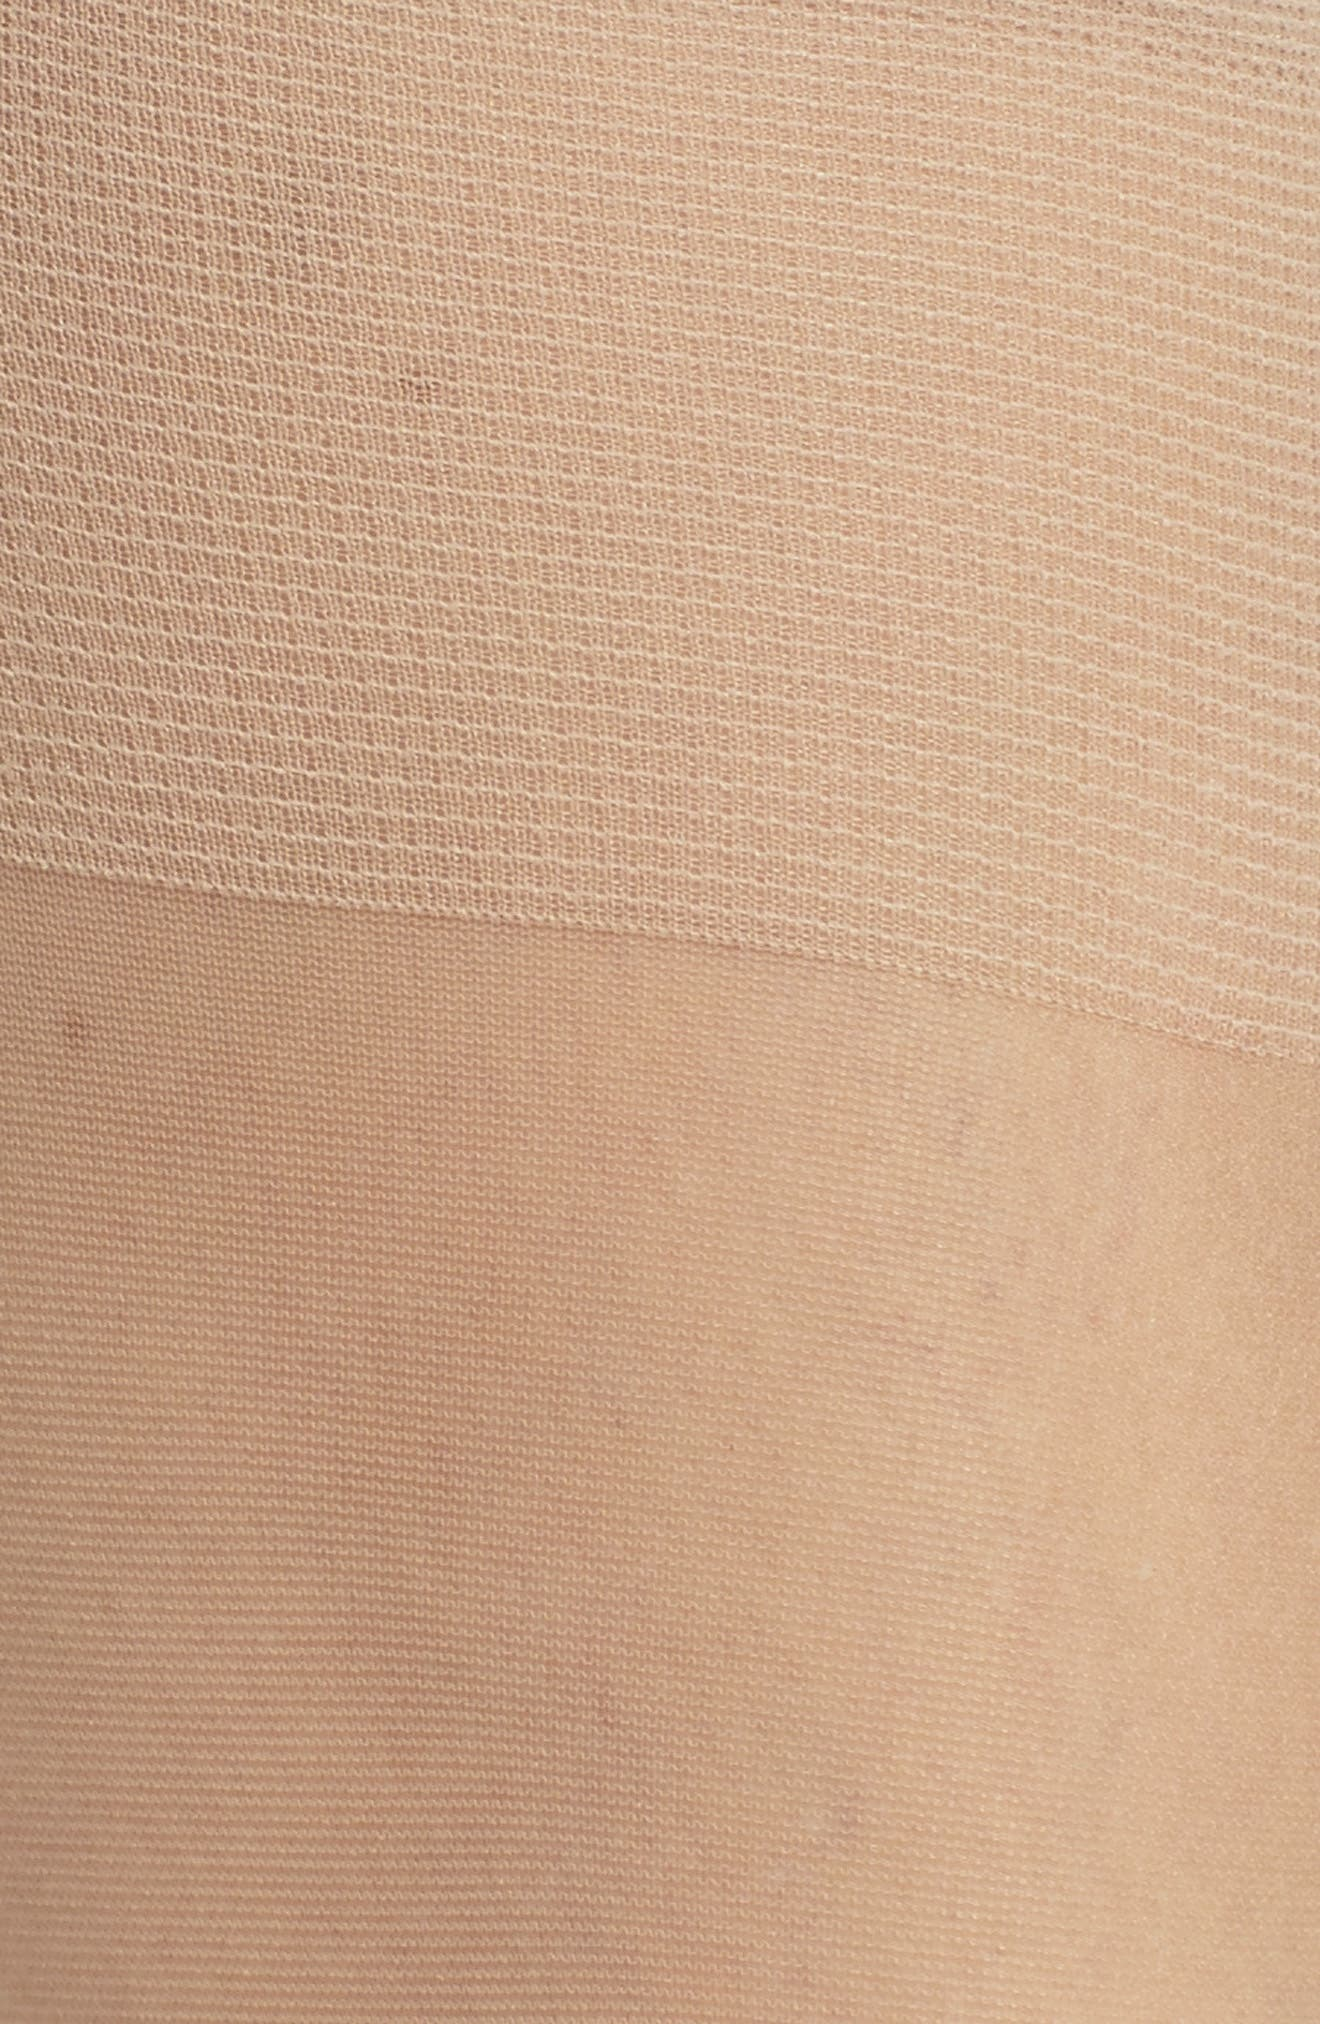 NORDSTROM, 3-Pack Sheer Knee Highs, Alternate thumbnail 3, color, LIGHT NUDE